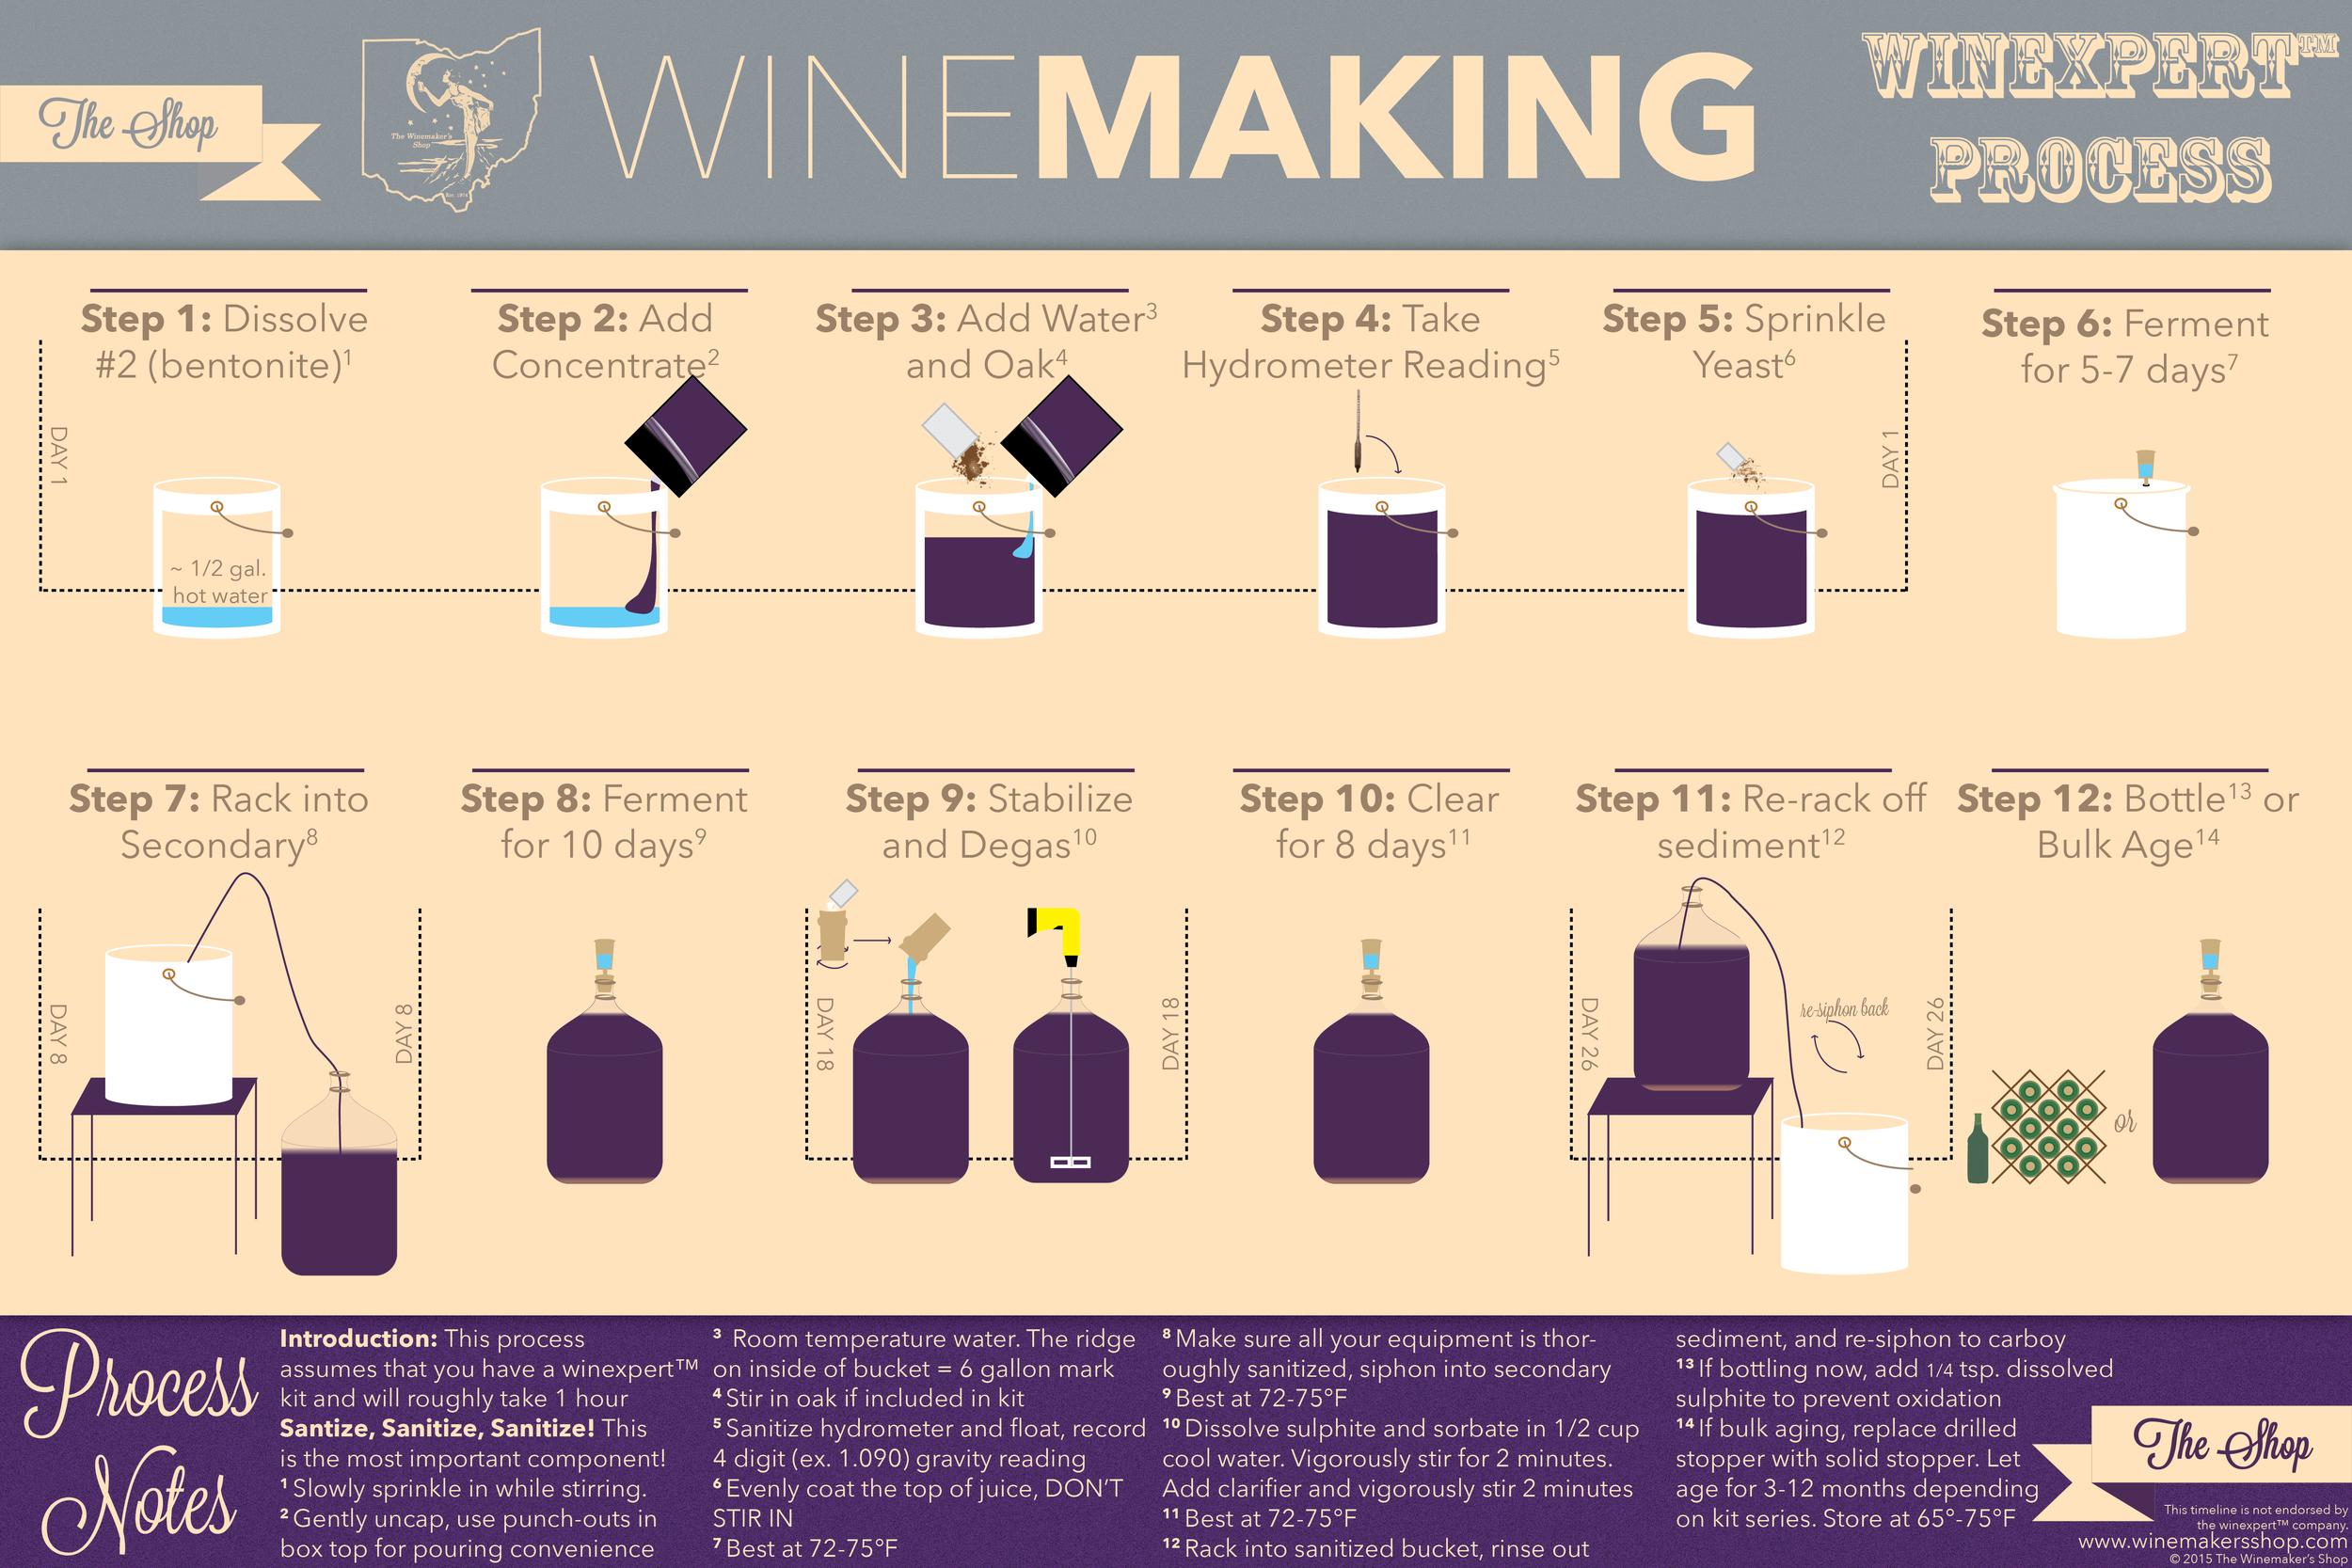 Winemaking-Timeline